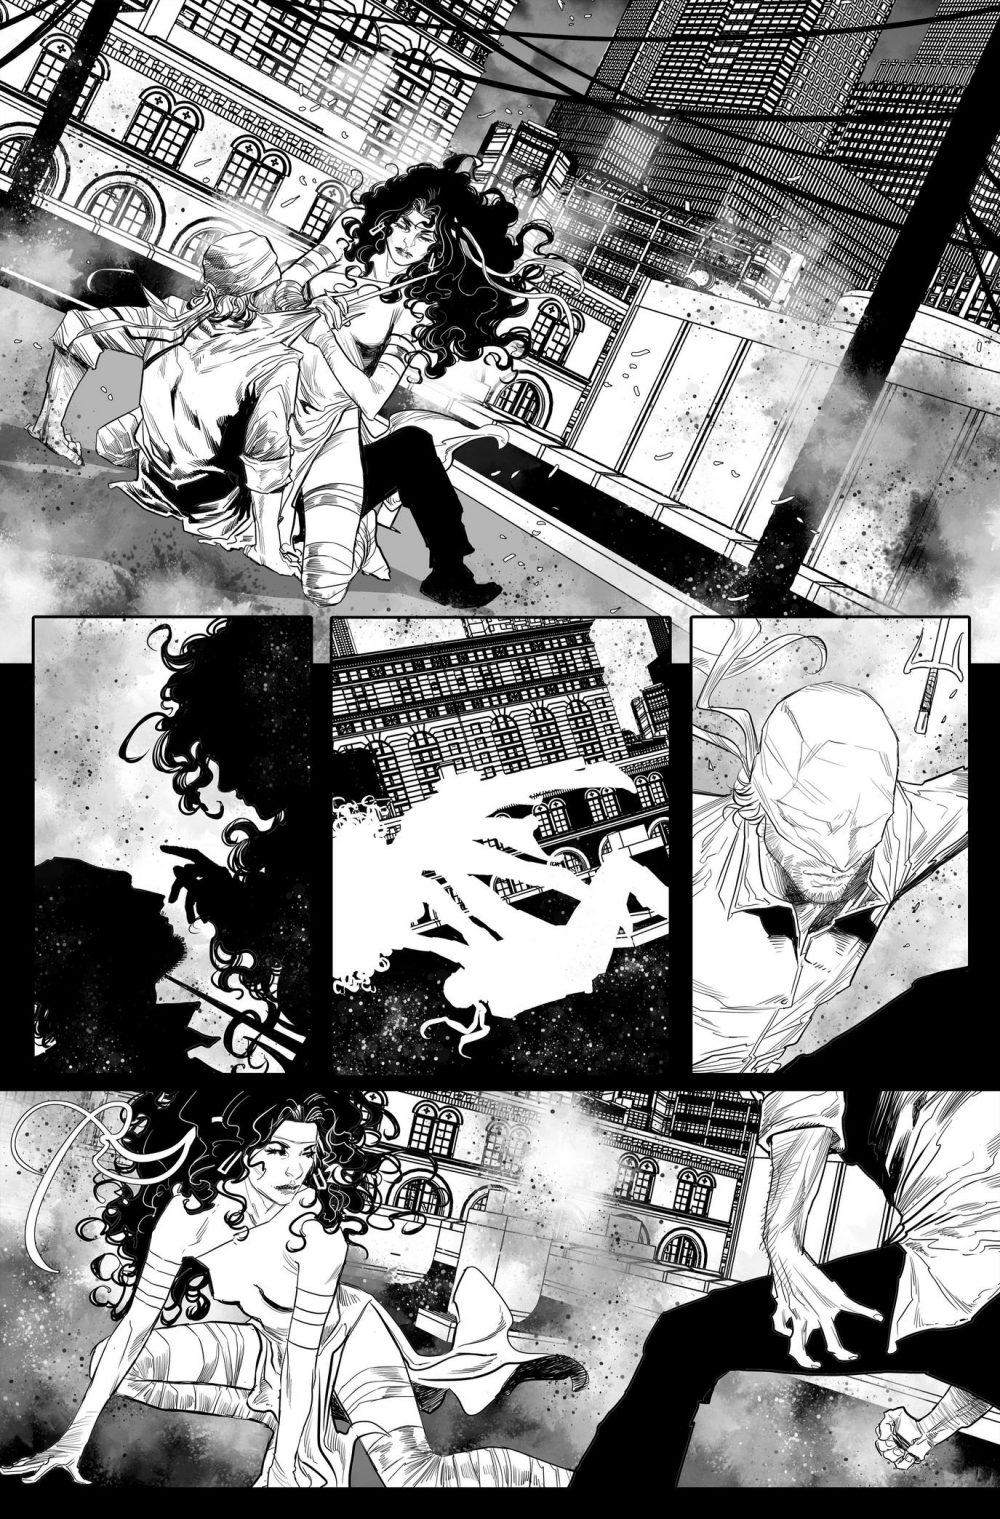 Daredevil #11, anteprima 01 (chine)